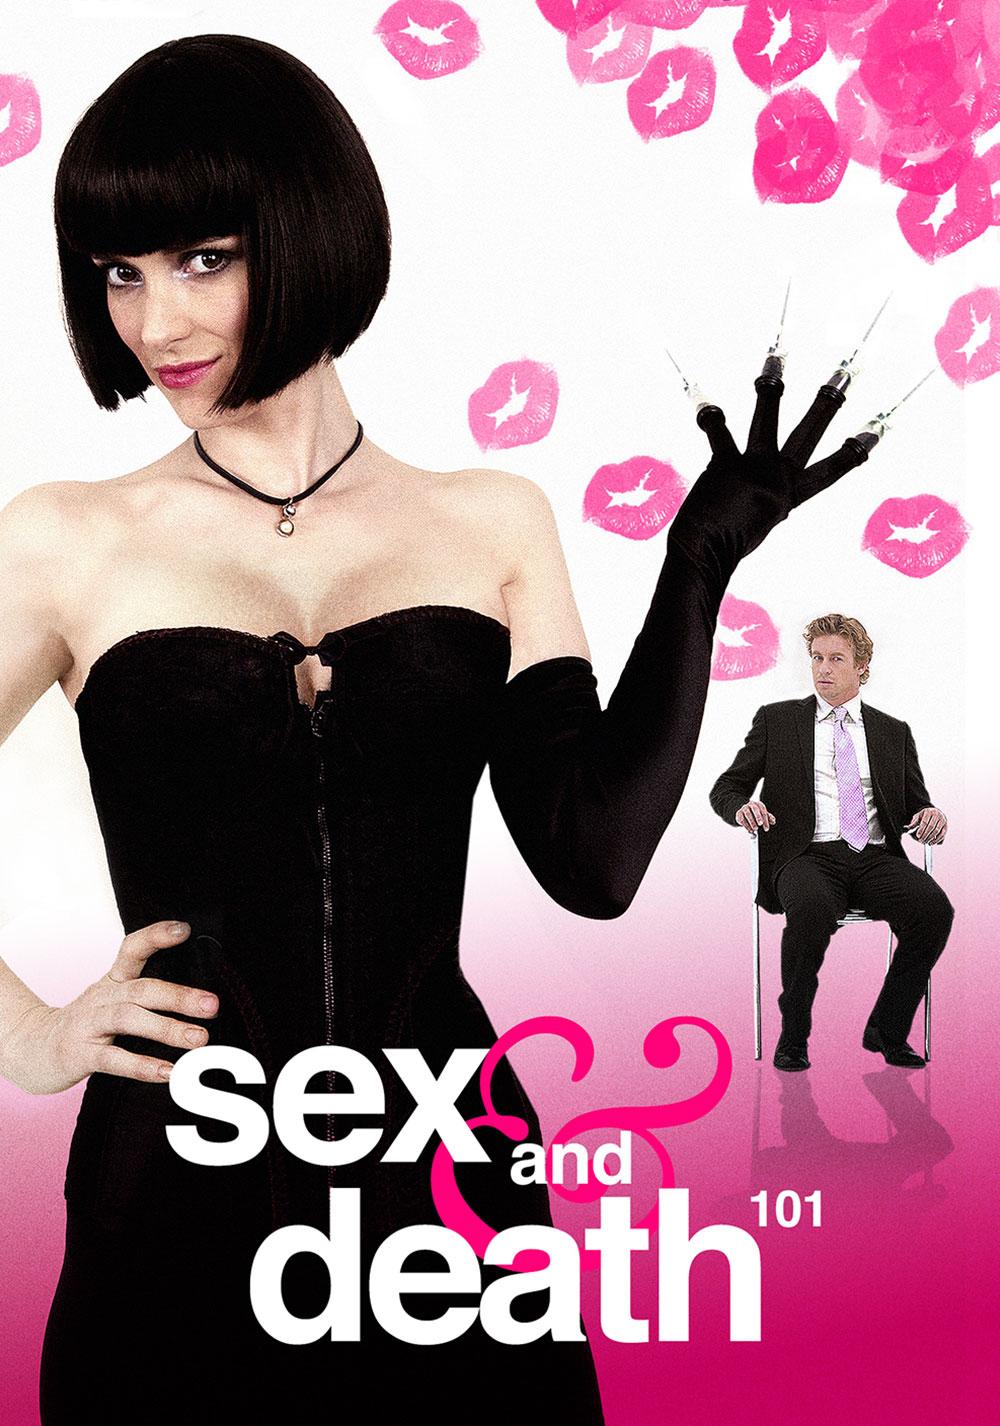 Sex death 101 movie cover